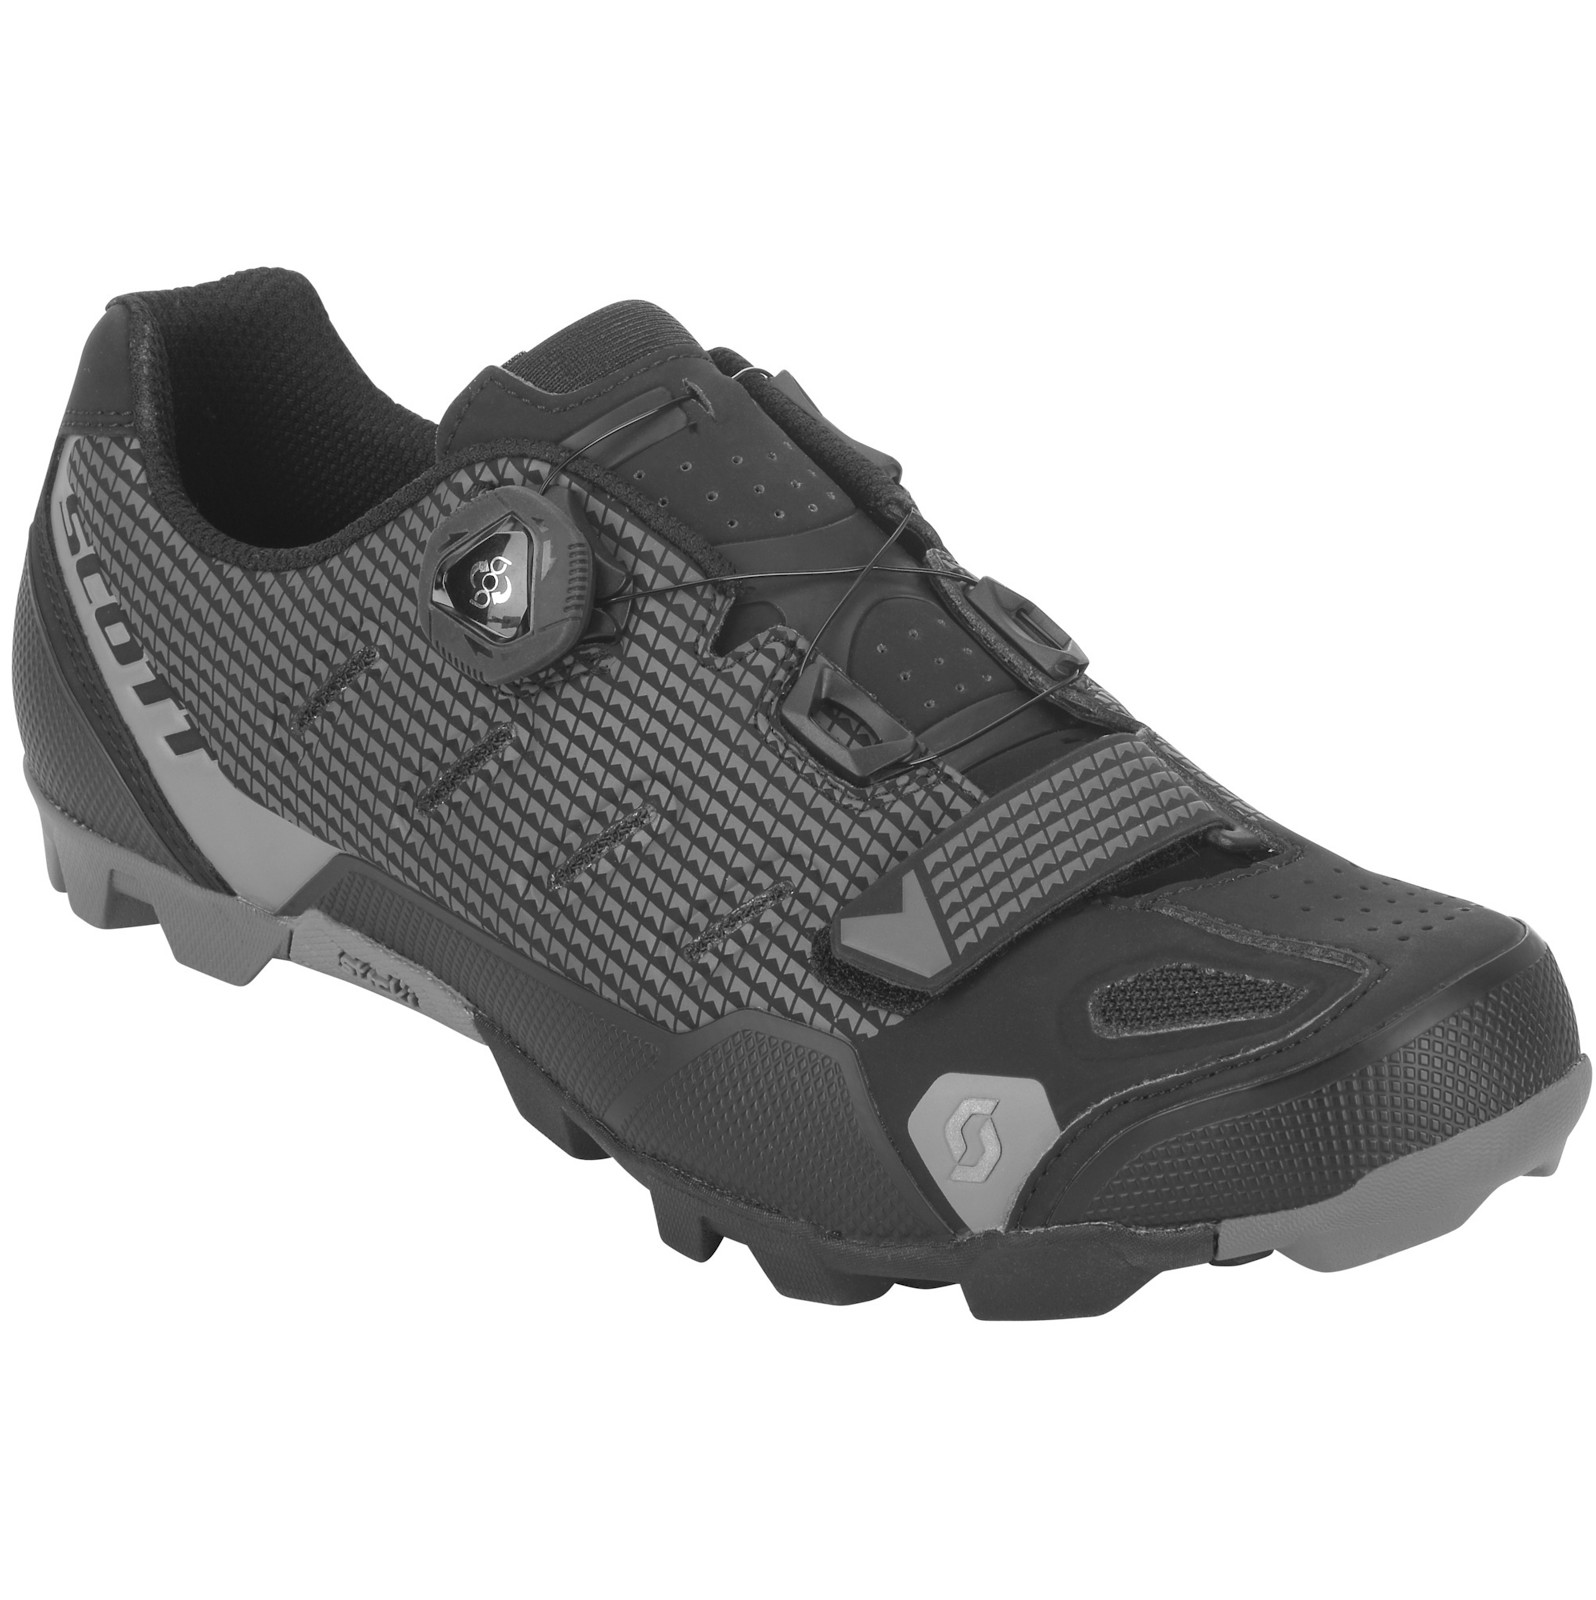 Scott Prowl-r RS shoe in matte black/matte anthracite